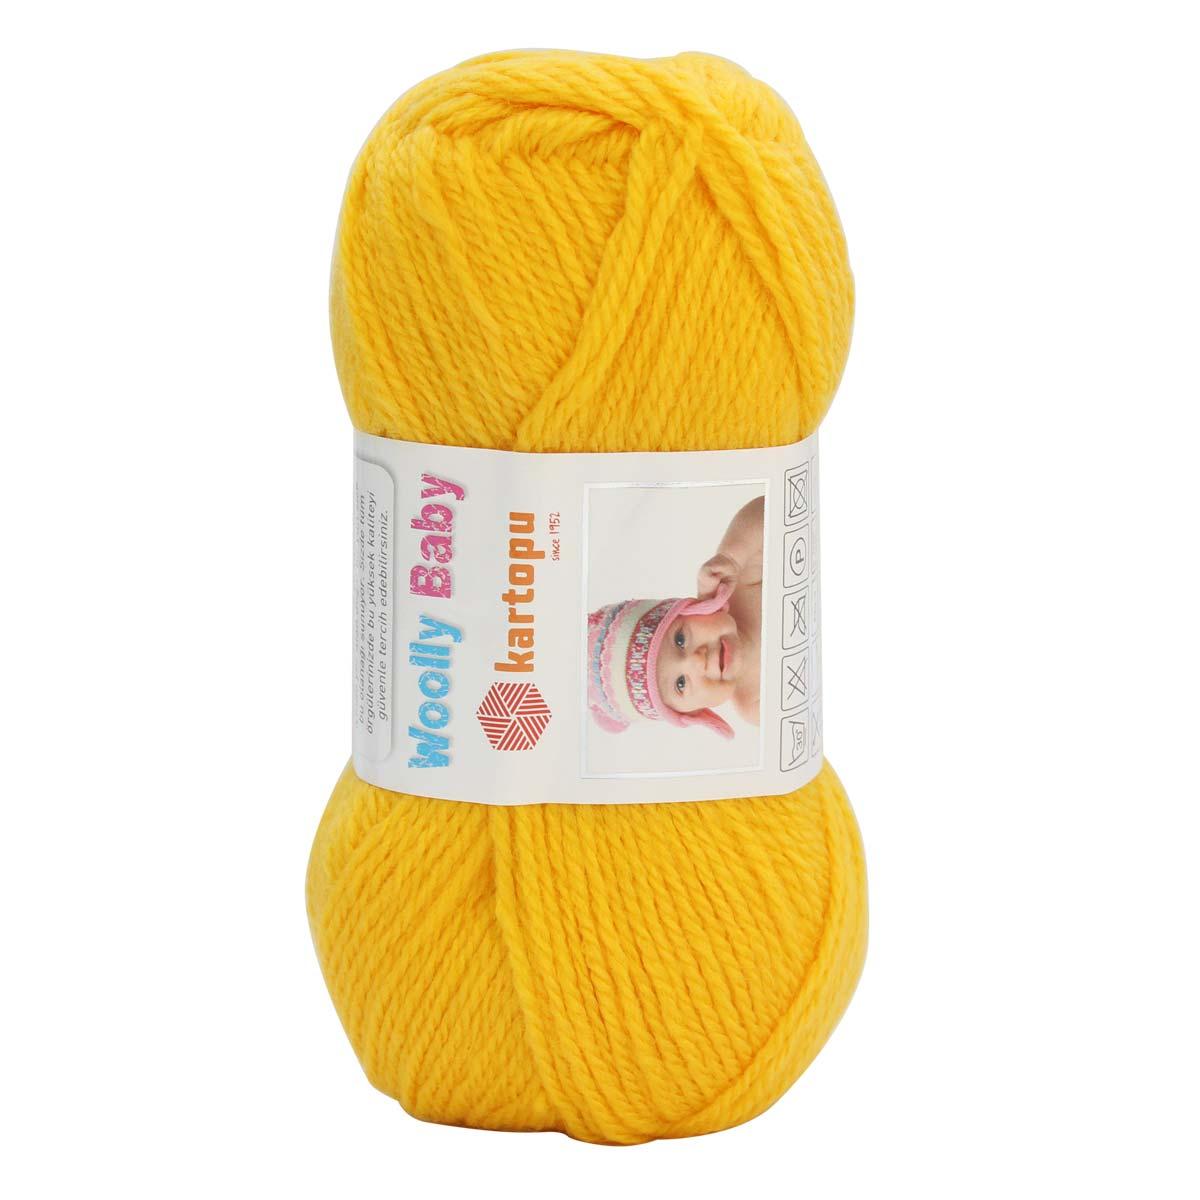 Пряжа KARTOPU 'Wolly Baby' 50гр. 148м (50% акрил,30% шерсть, 20% полиамид)